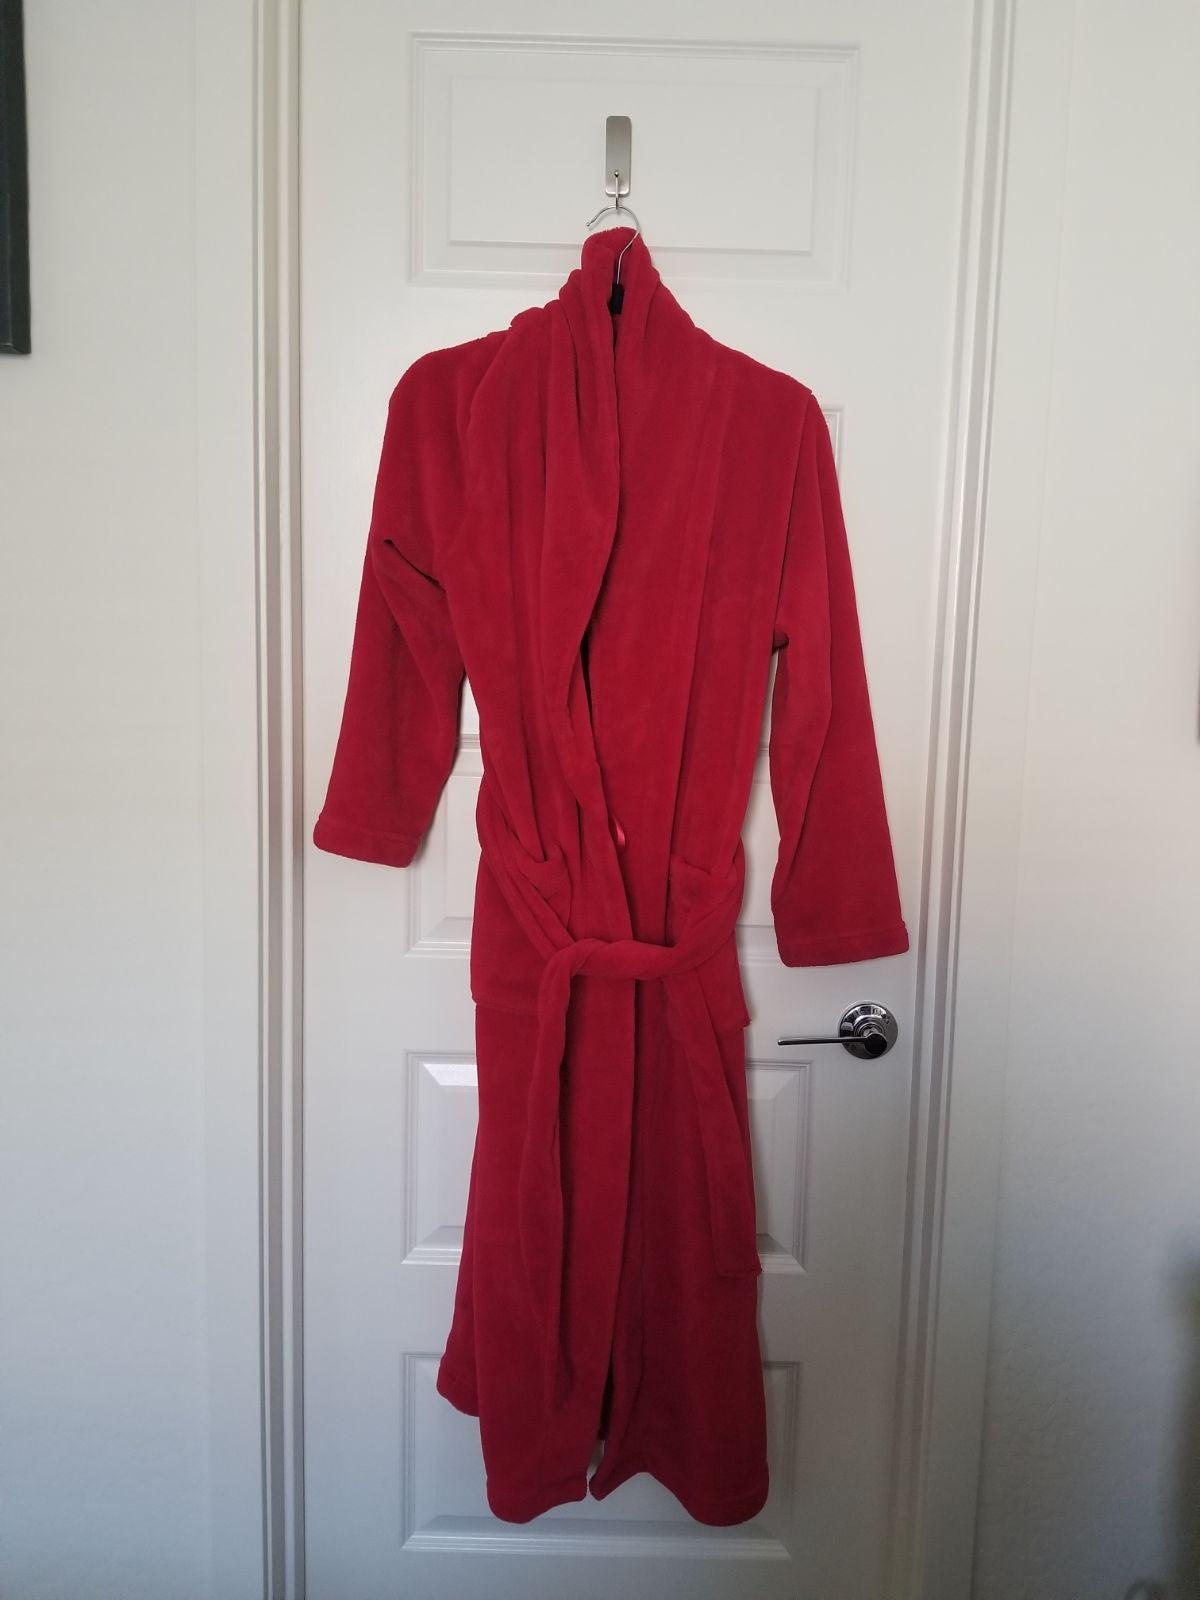 Adonna Full Length Bath Robe